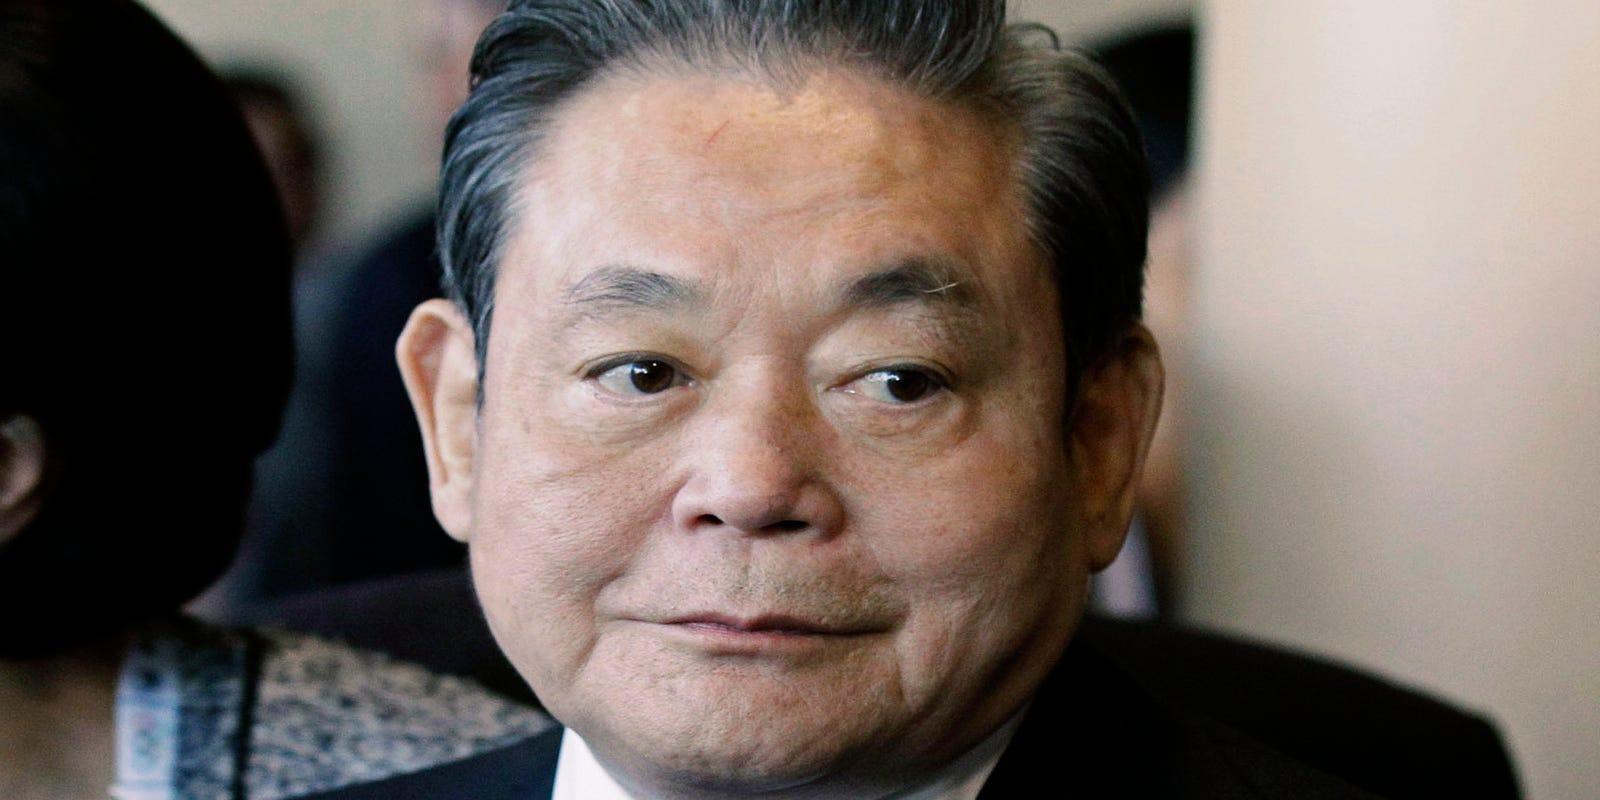 Lee Kun-Hee, Samsung Electronics chairman, dies at 78